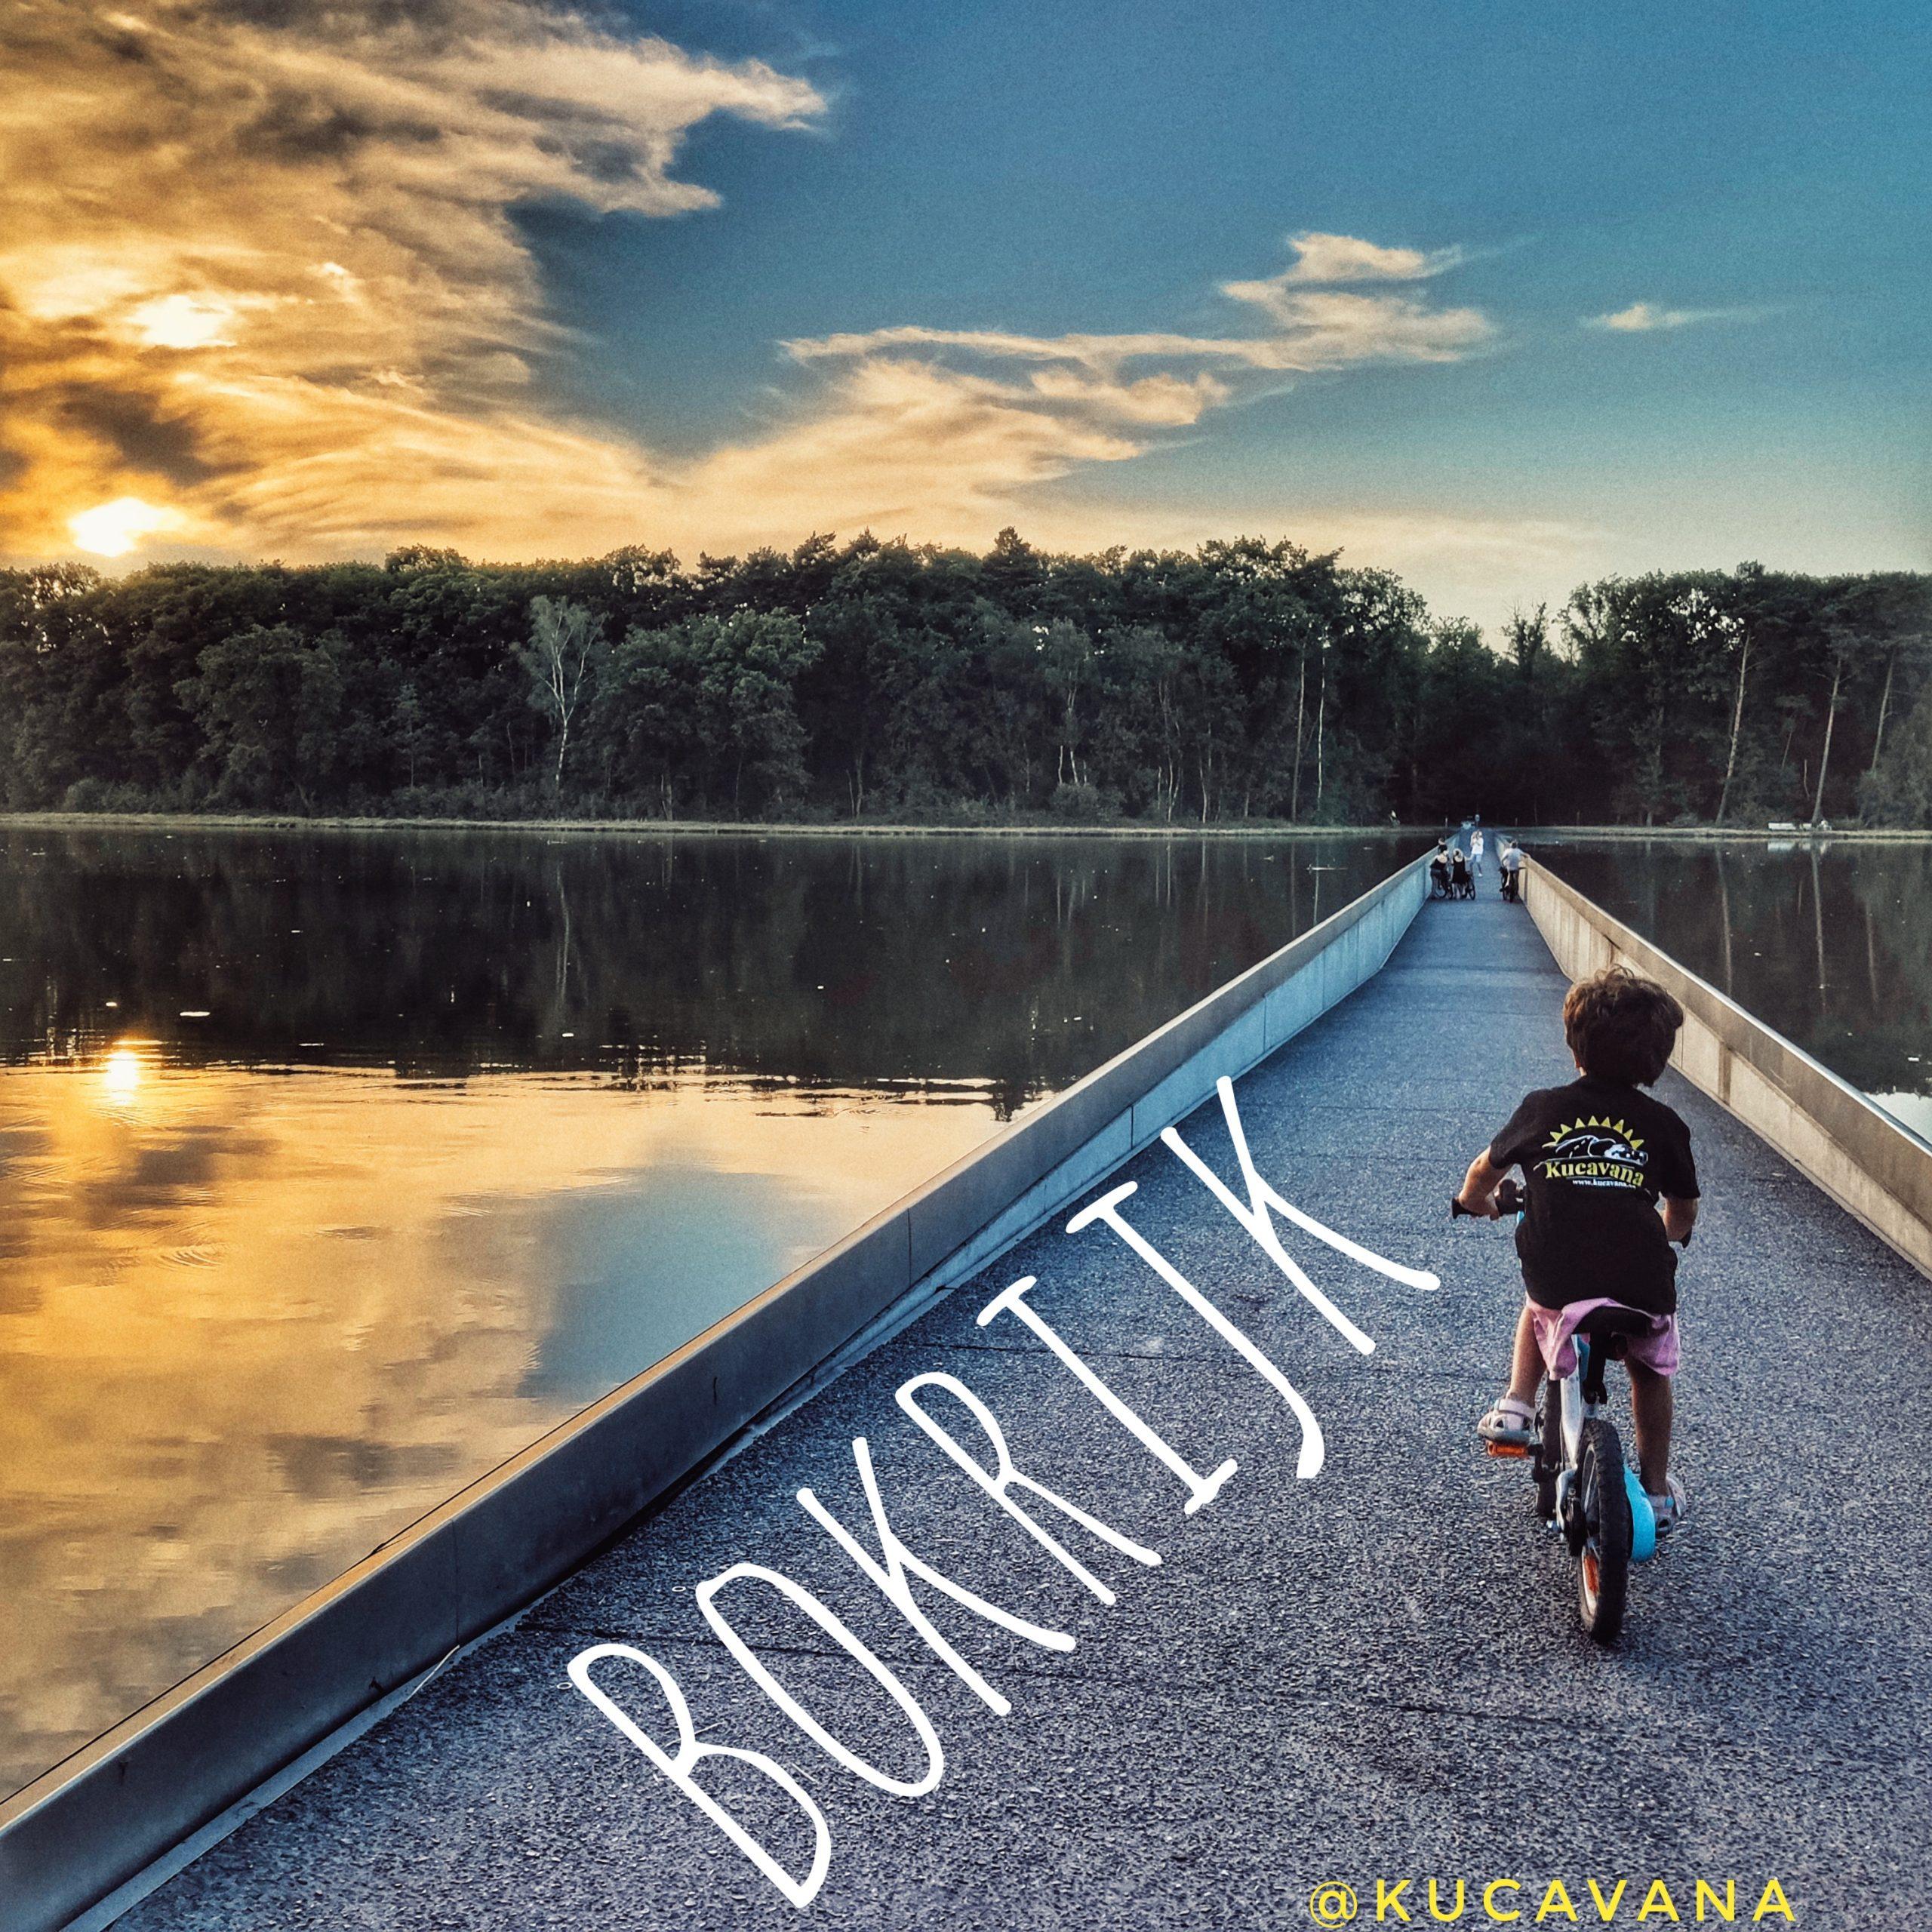 Bokrijk Fietsen Door de Bomen, une piste cyclable sur l'eau